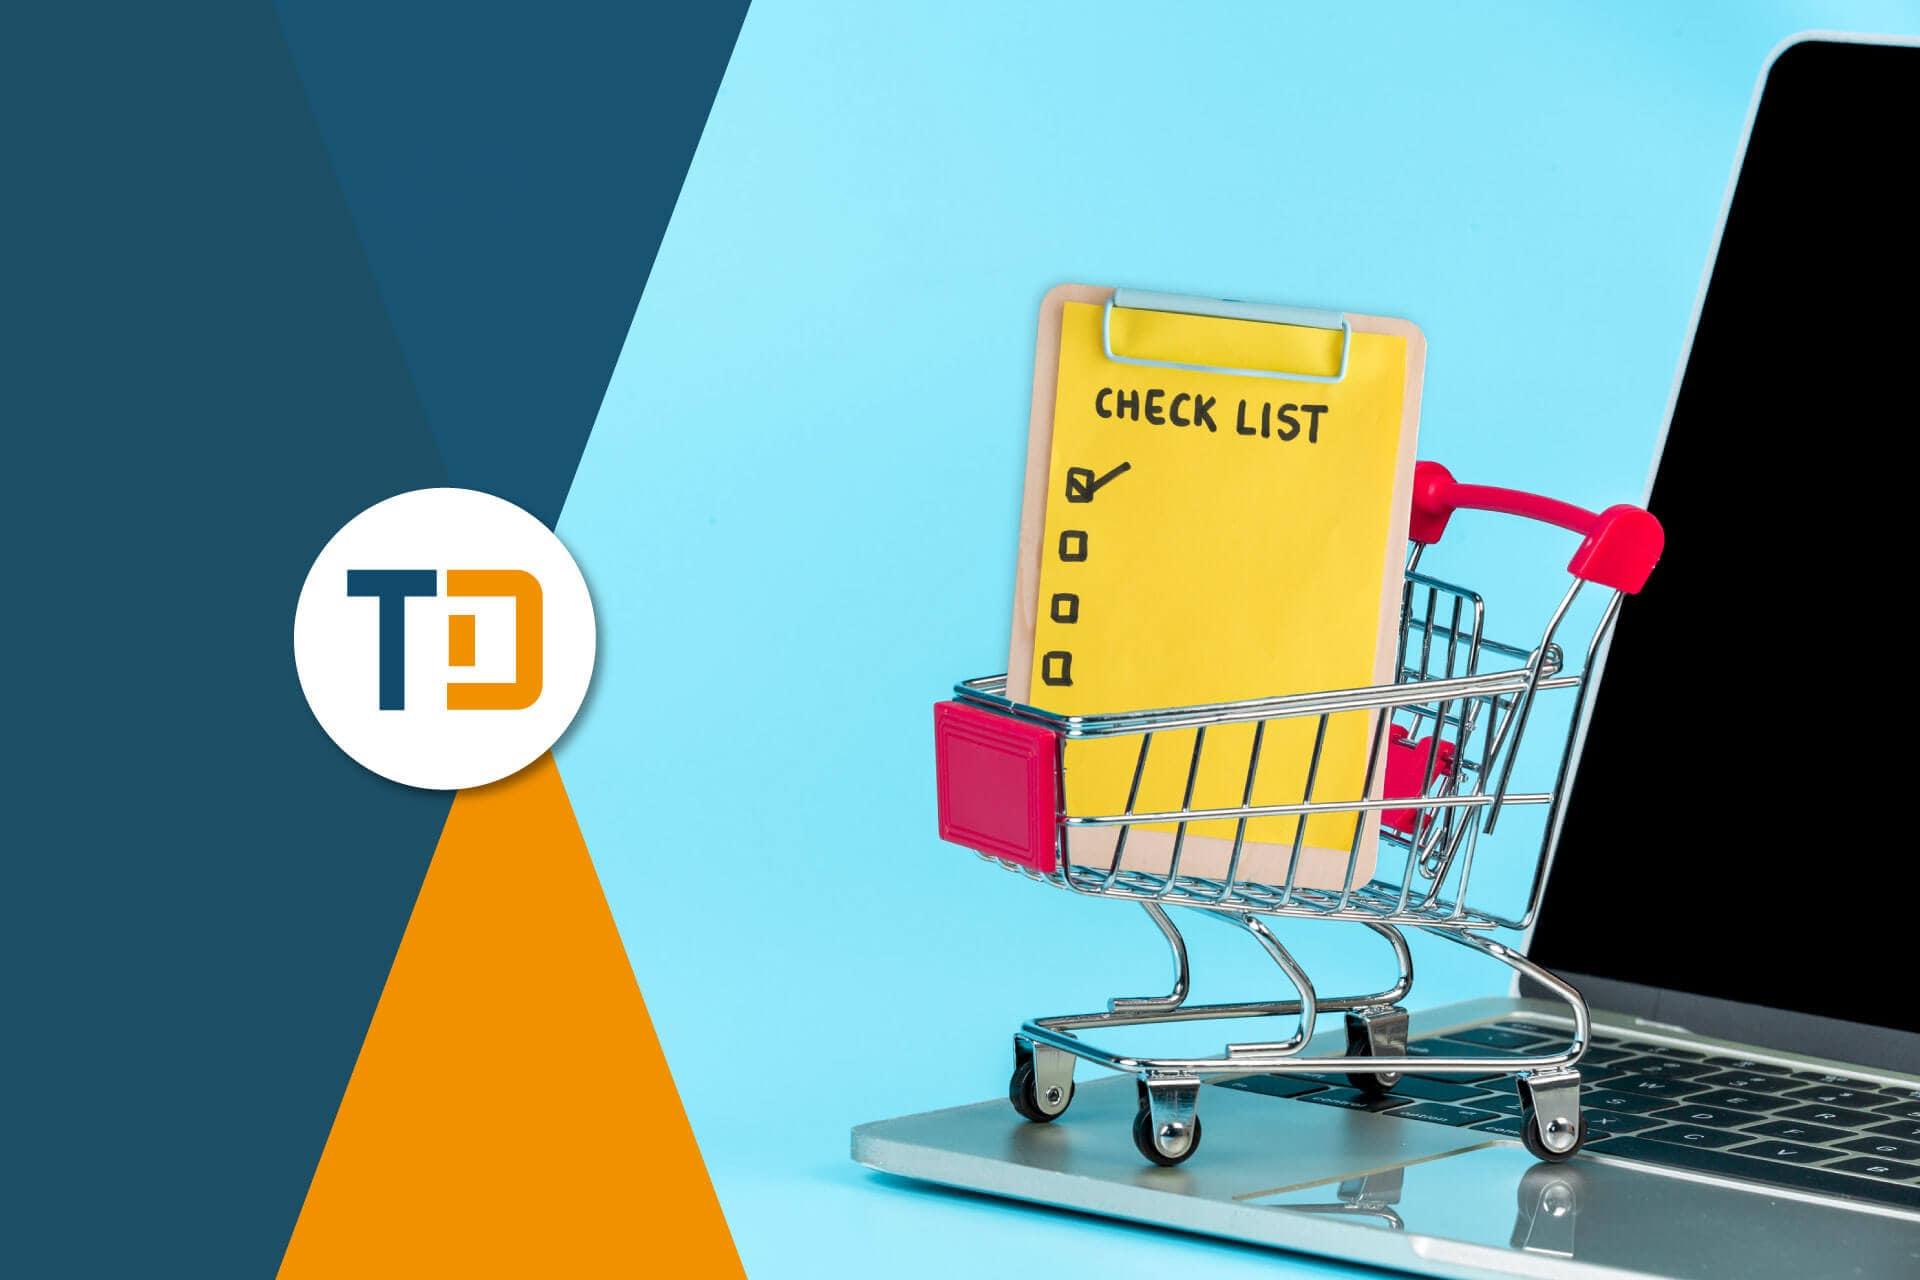 gestione ecommerce con software Telnet Data